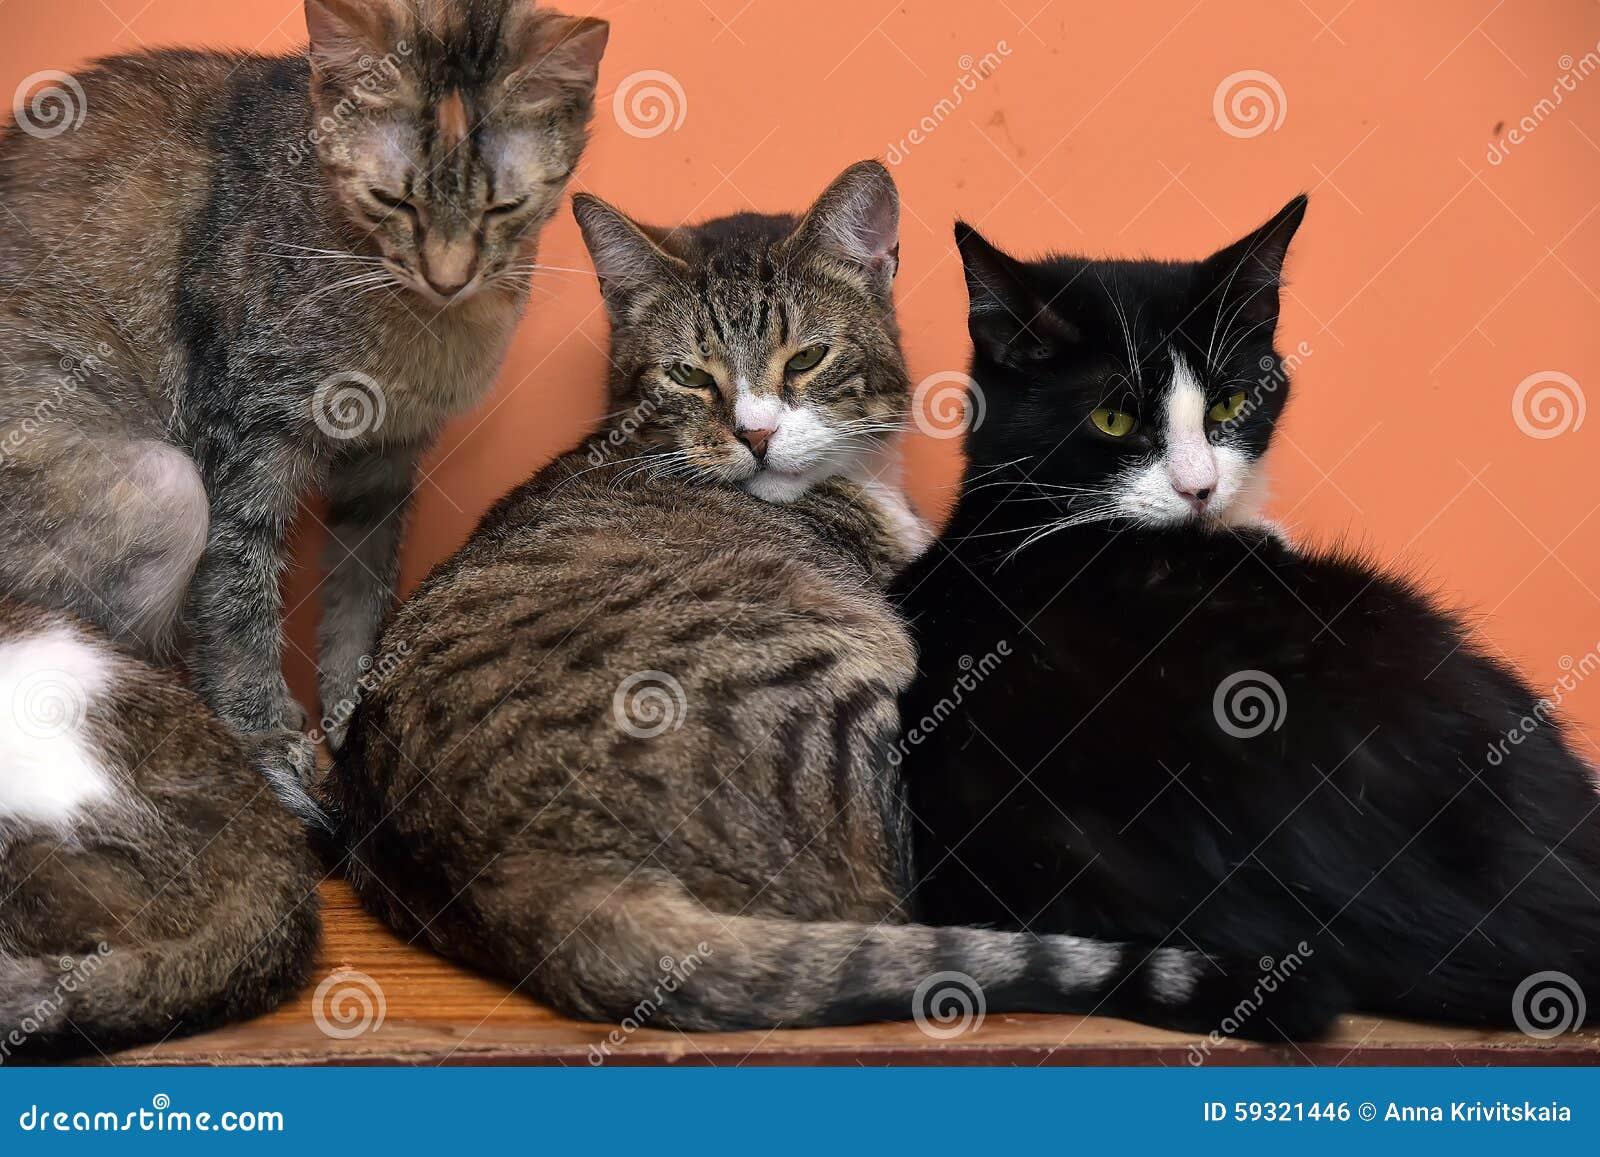 59344a41e64e Γάτες μαζί στο χαλί στο ζωικό καταφύγιο Στοκ Εικόνες - εικόνα από ...